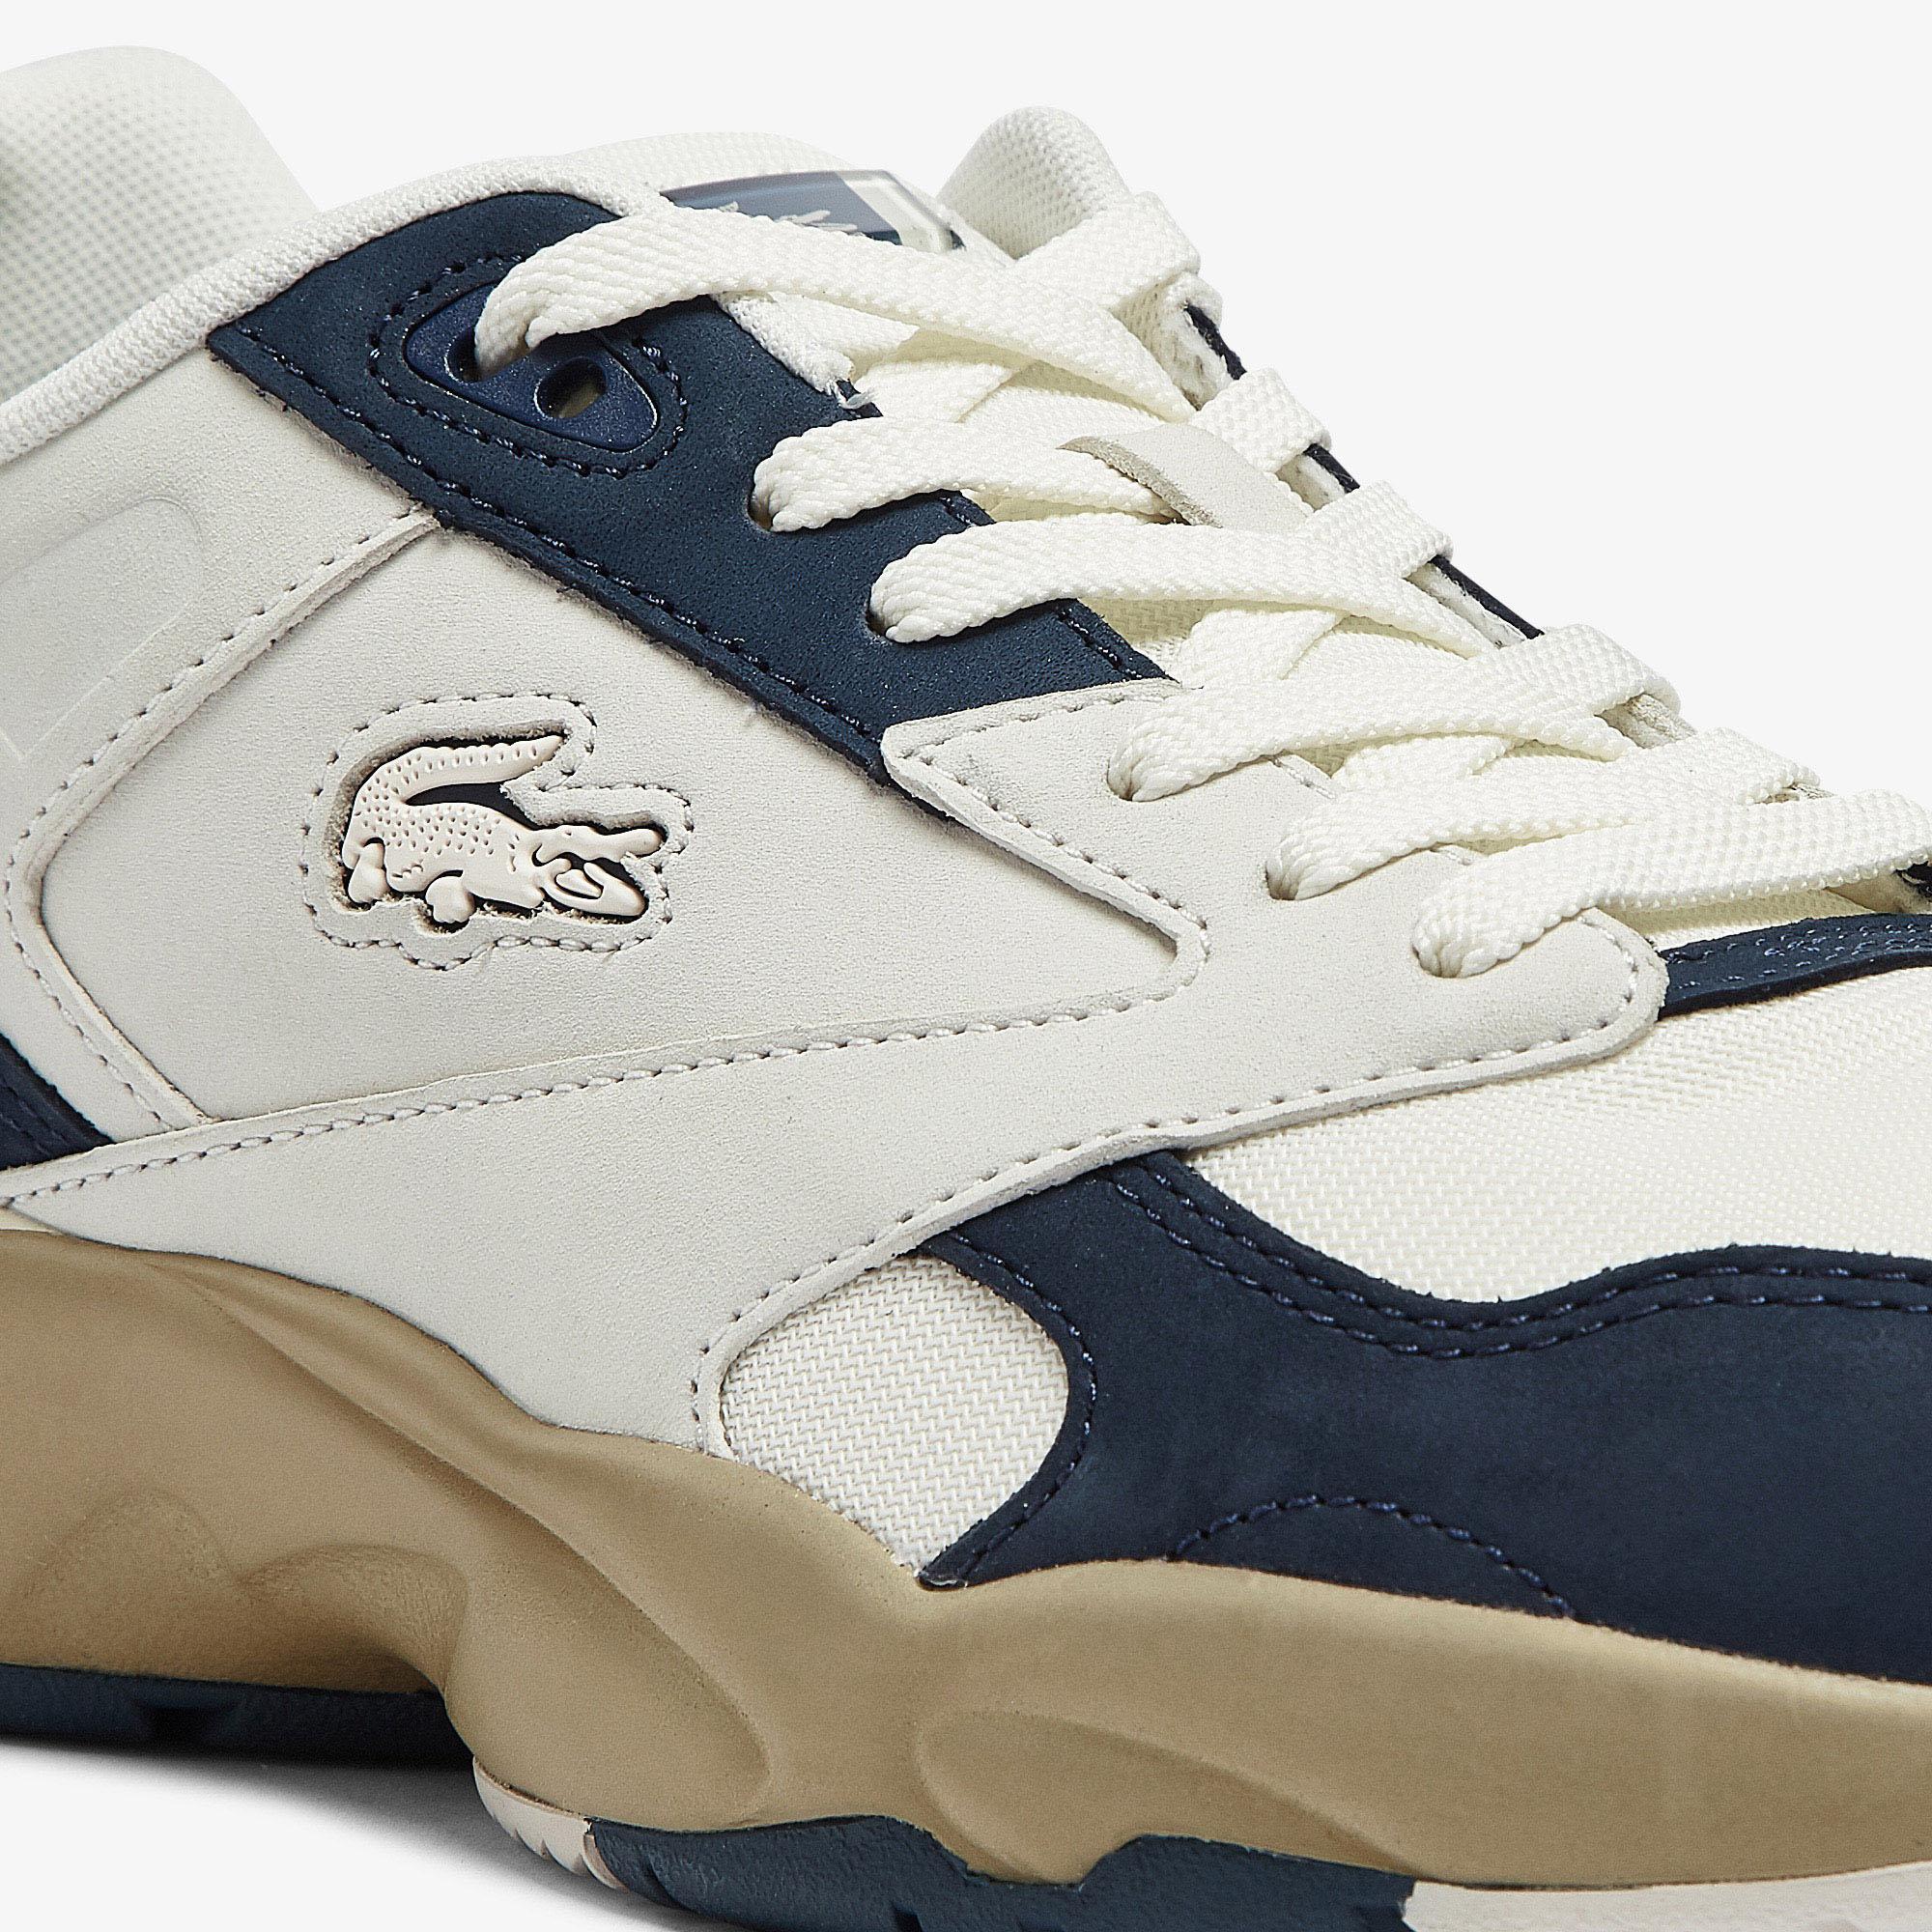 Lacoste Men's Storm 96 Lo Nubuck Leather Trainers